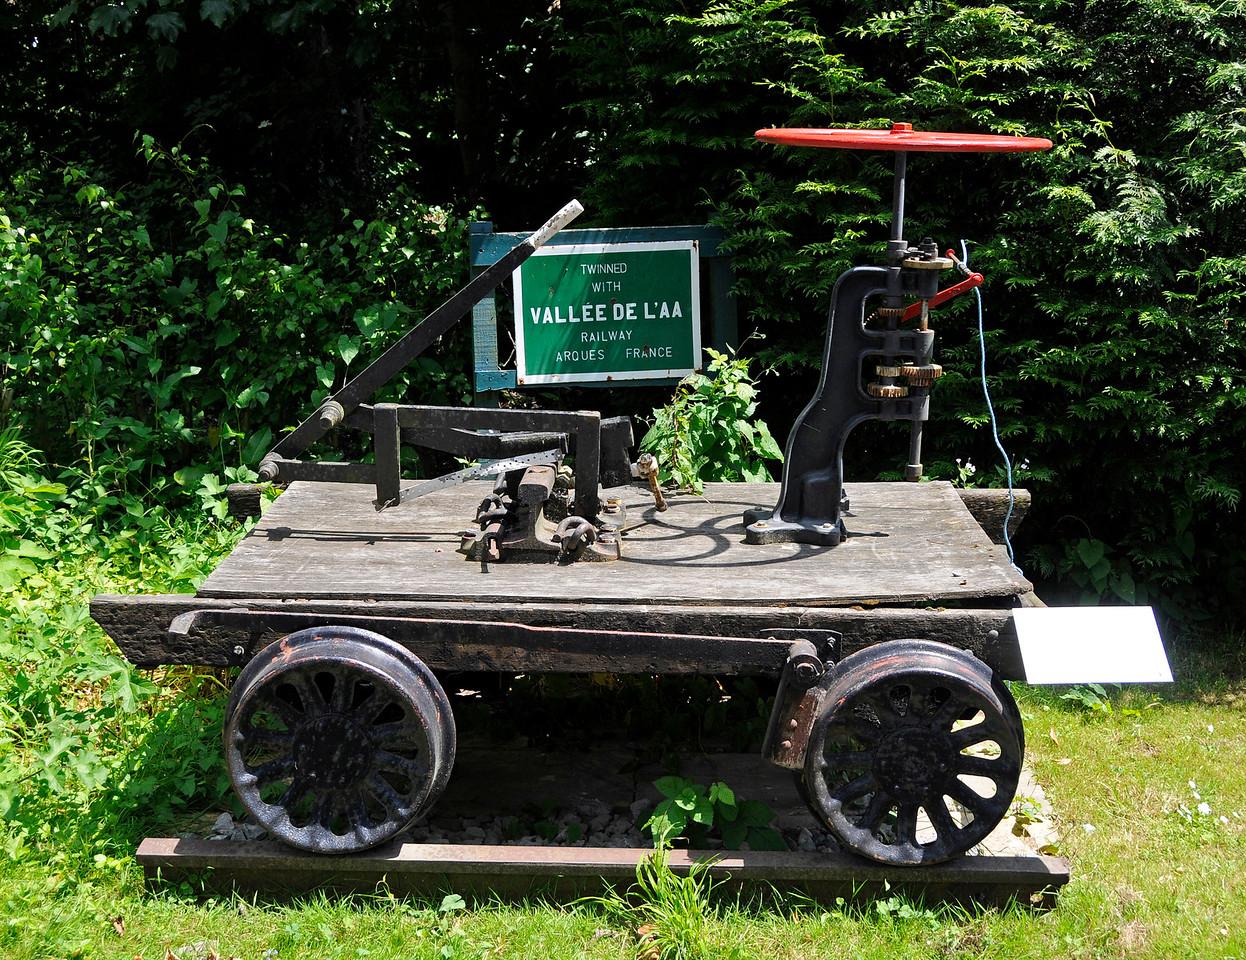 Industrial heritage items on display at Shepherdswell Station, East Kent Railway.  17.06.2015  12761